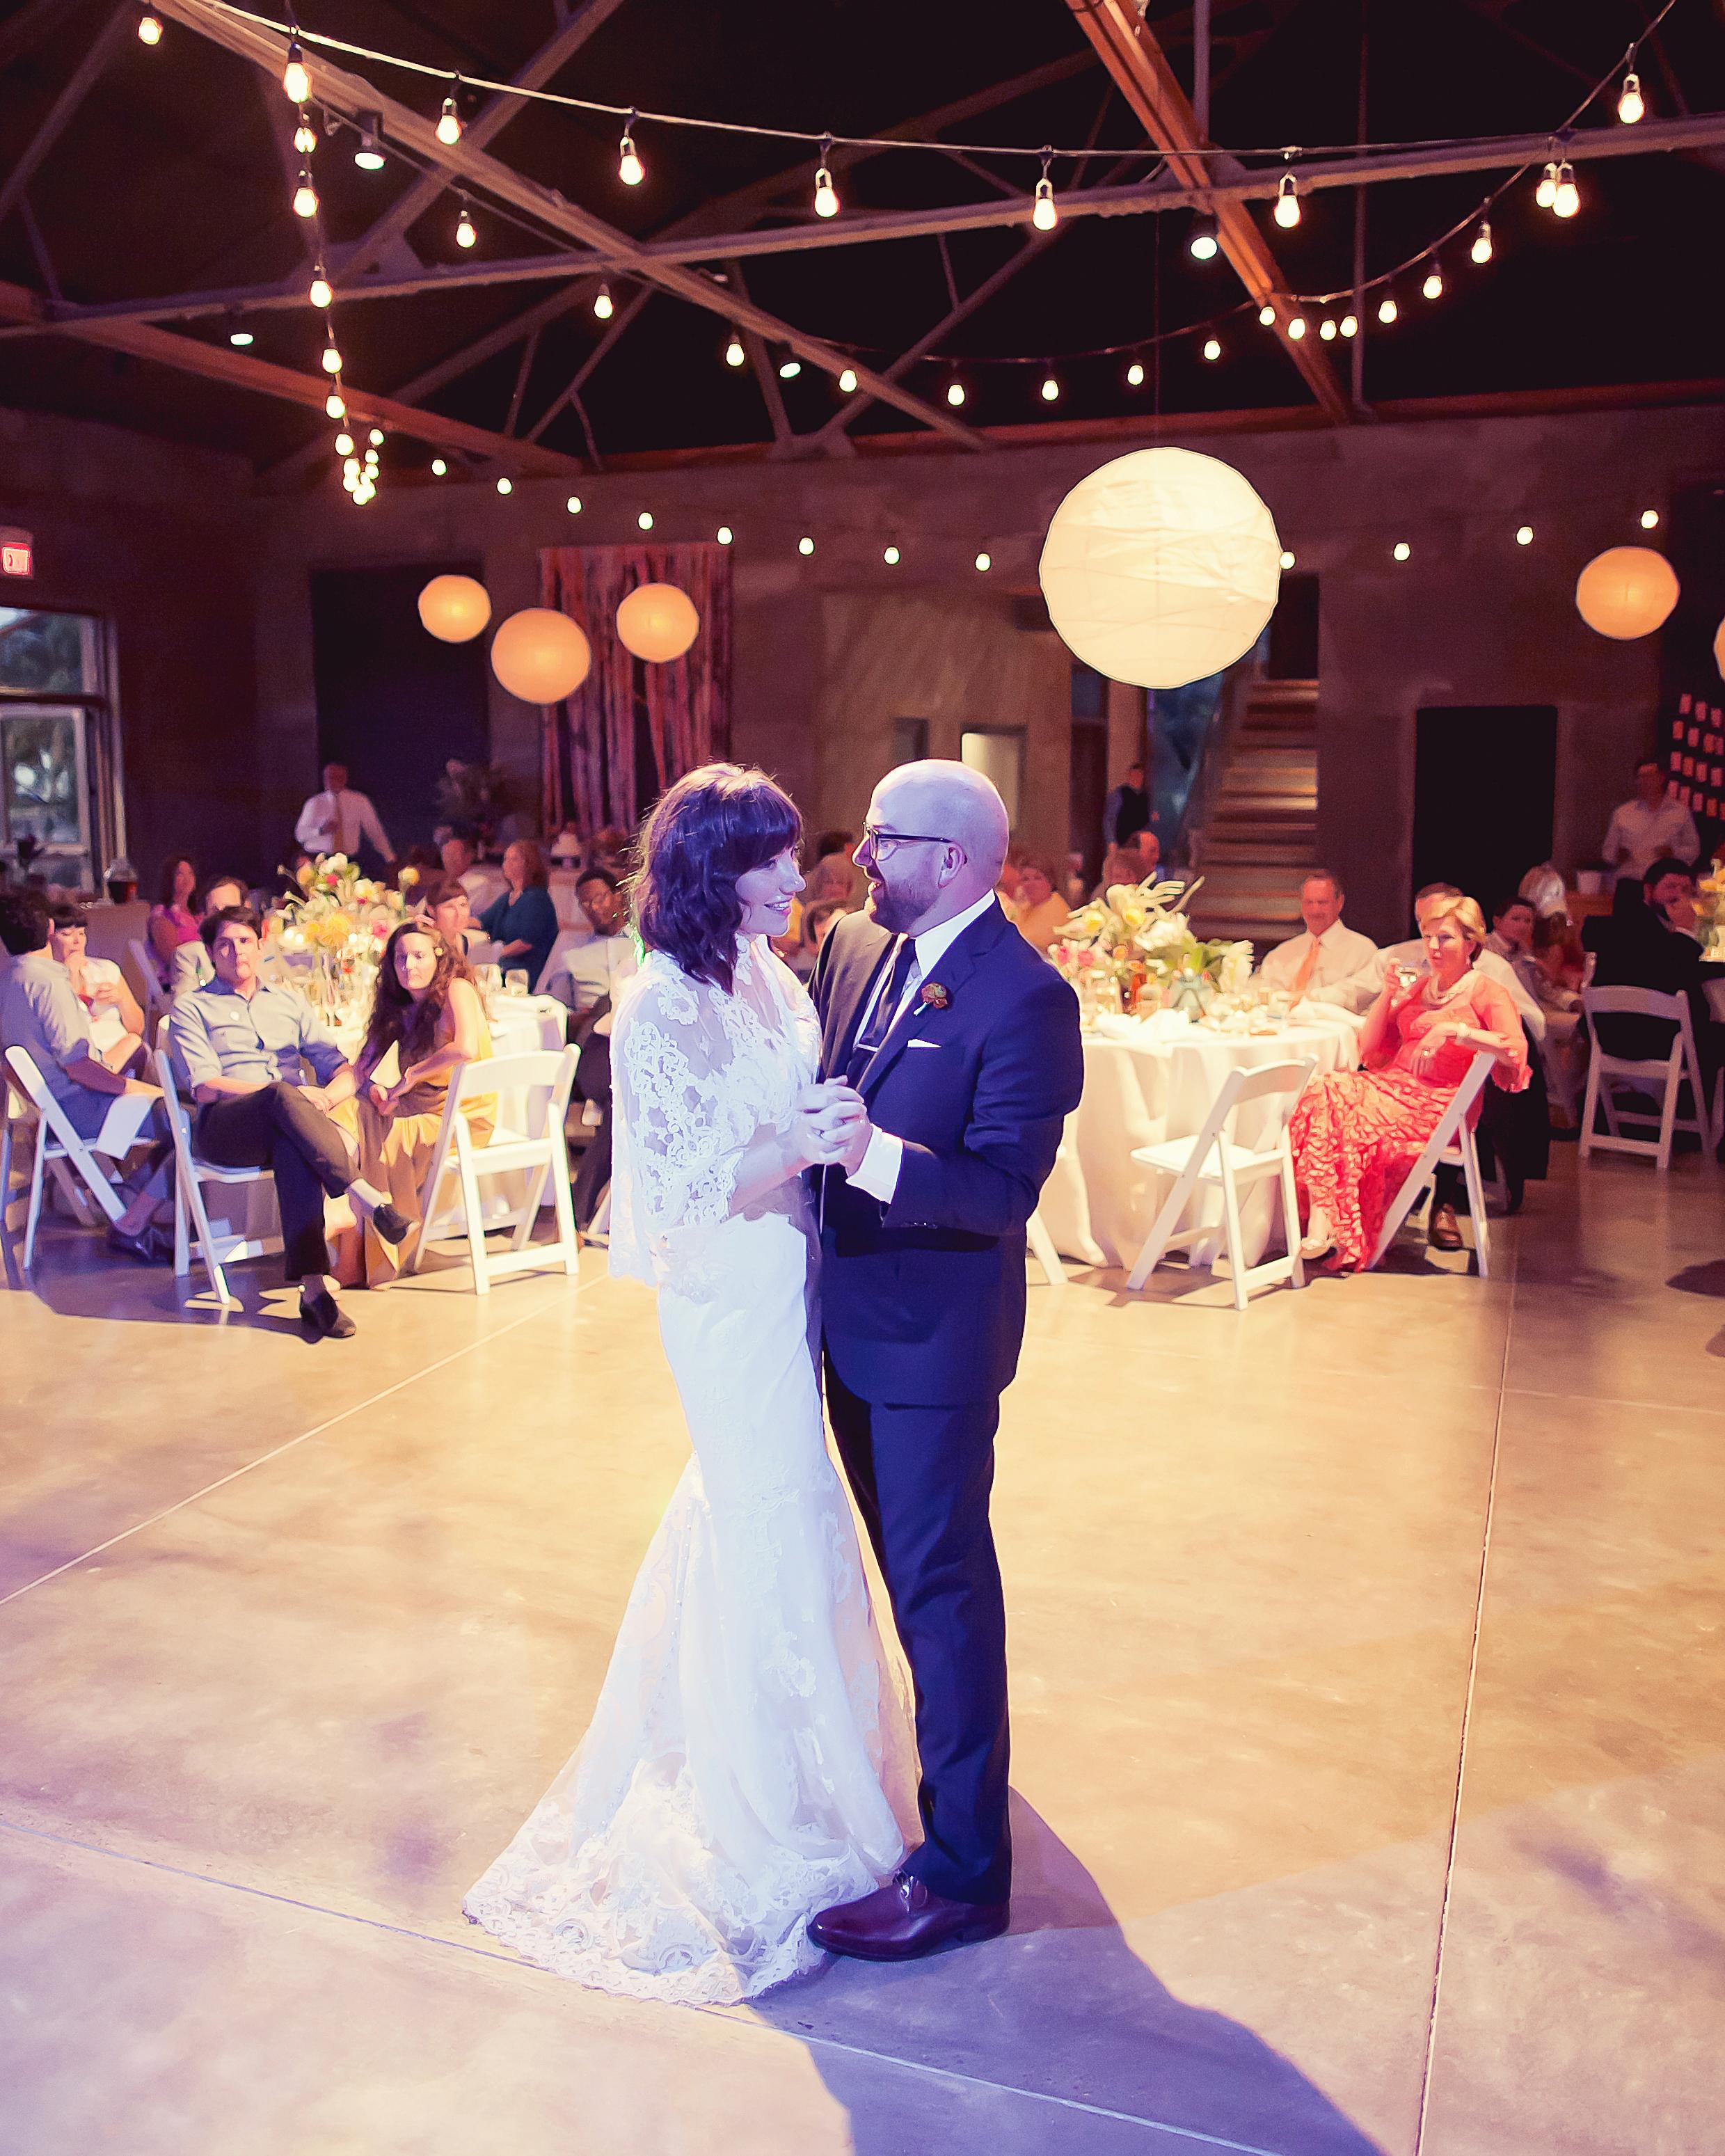 wedding-cover-bands-opener-0814.jpg